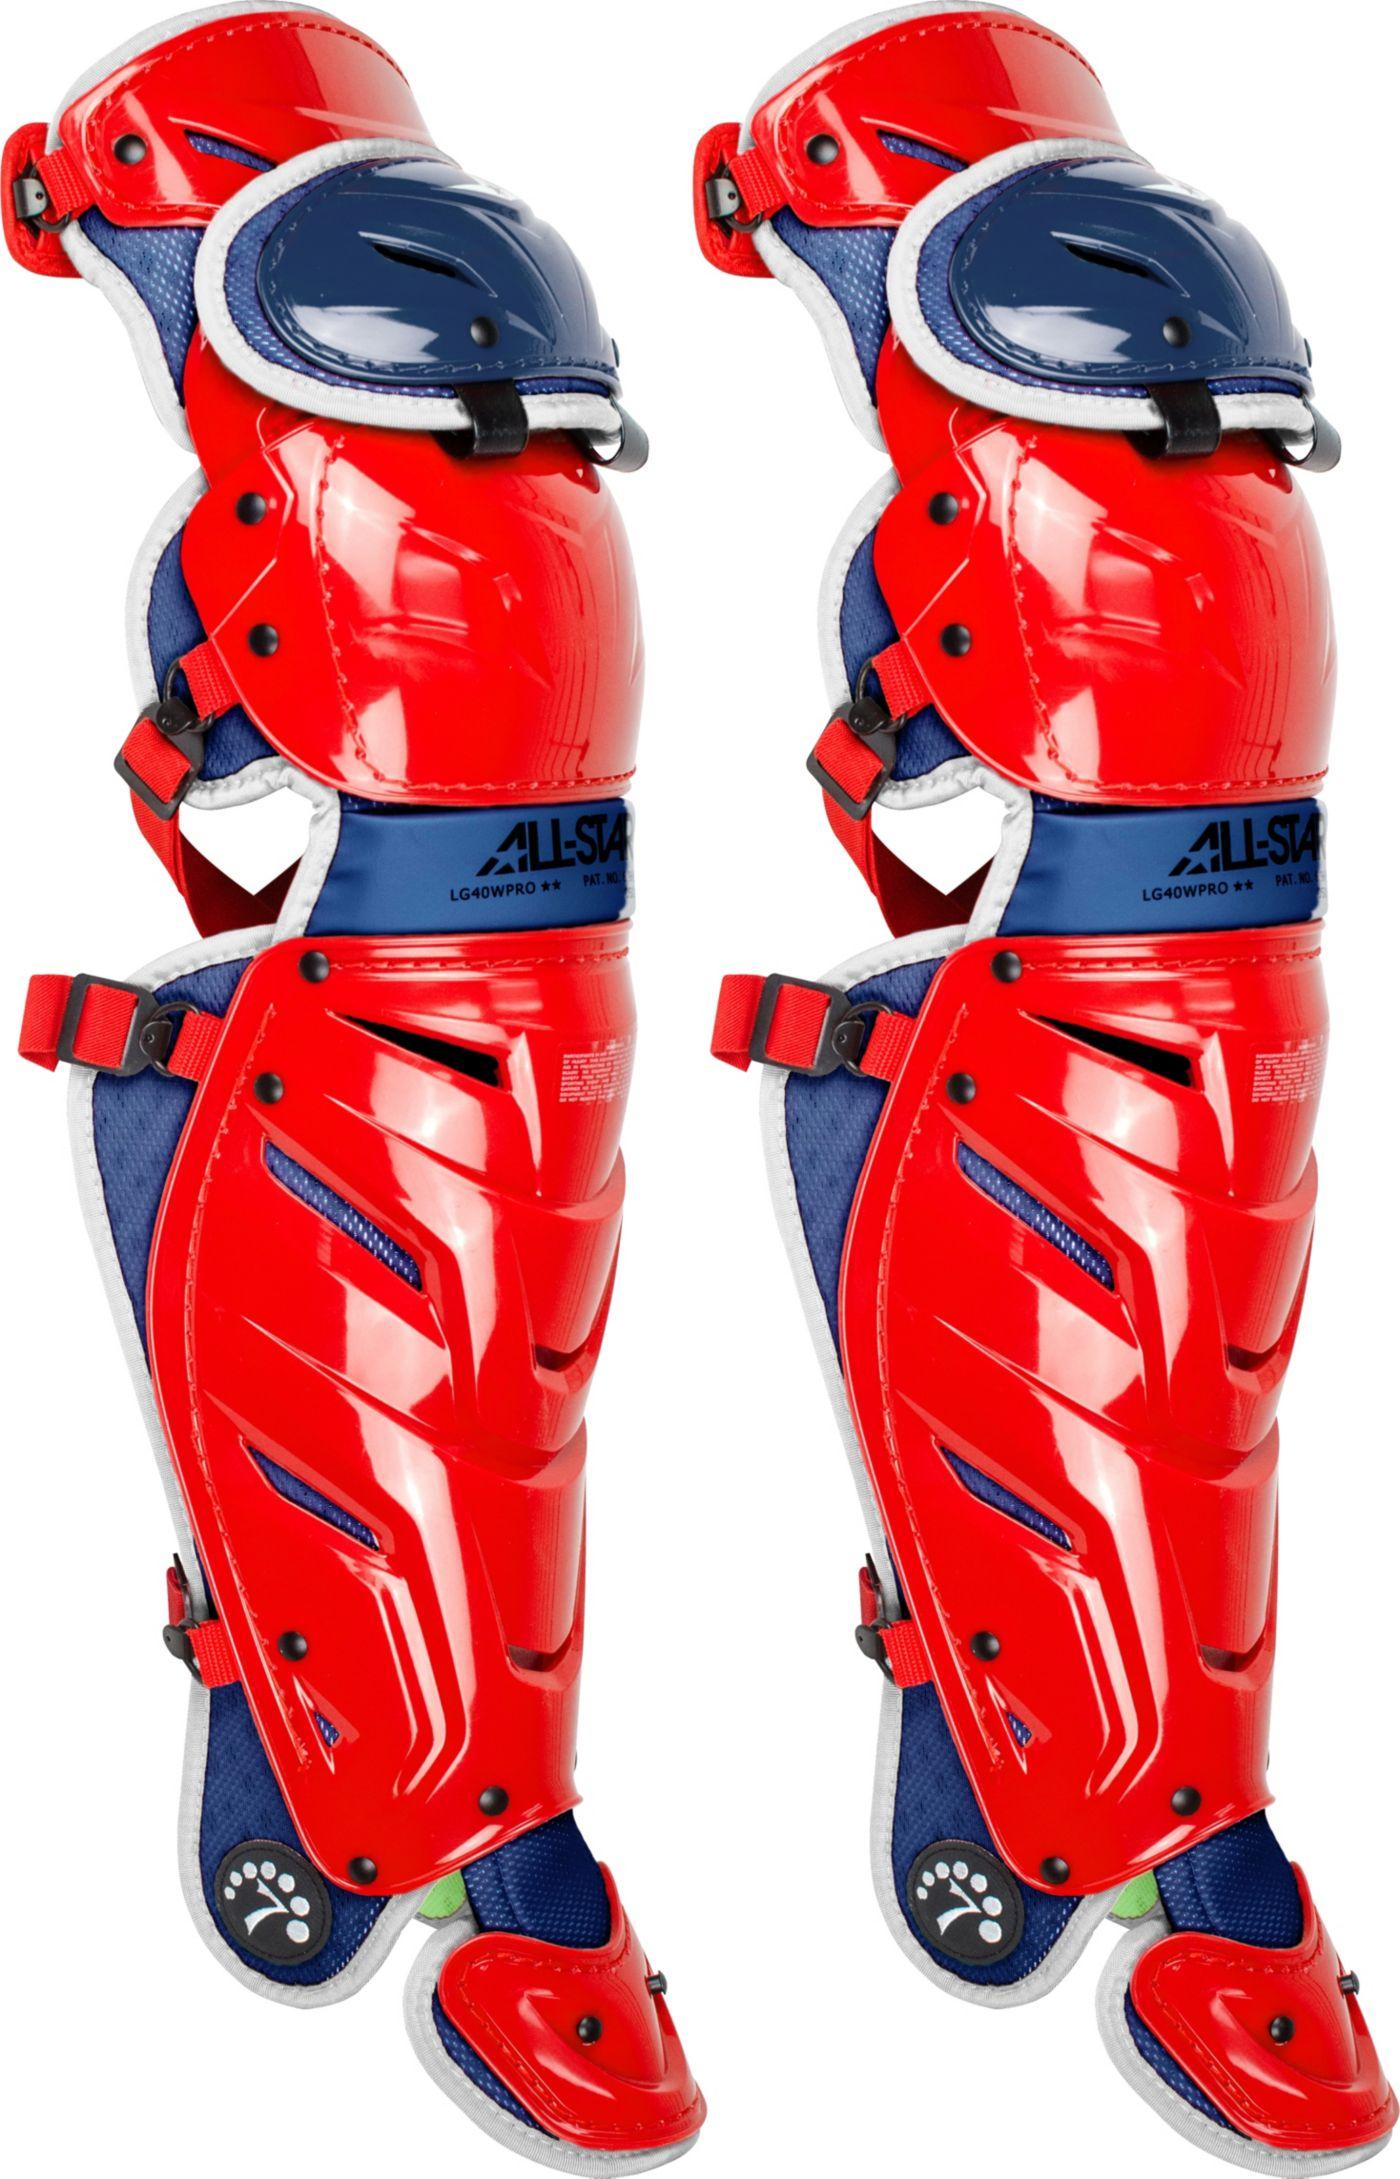 All-Star Intermediate 14.5'' S7 AXIS USA Leg Guards